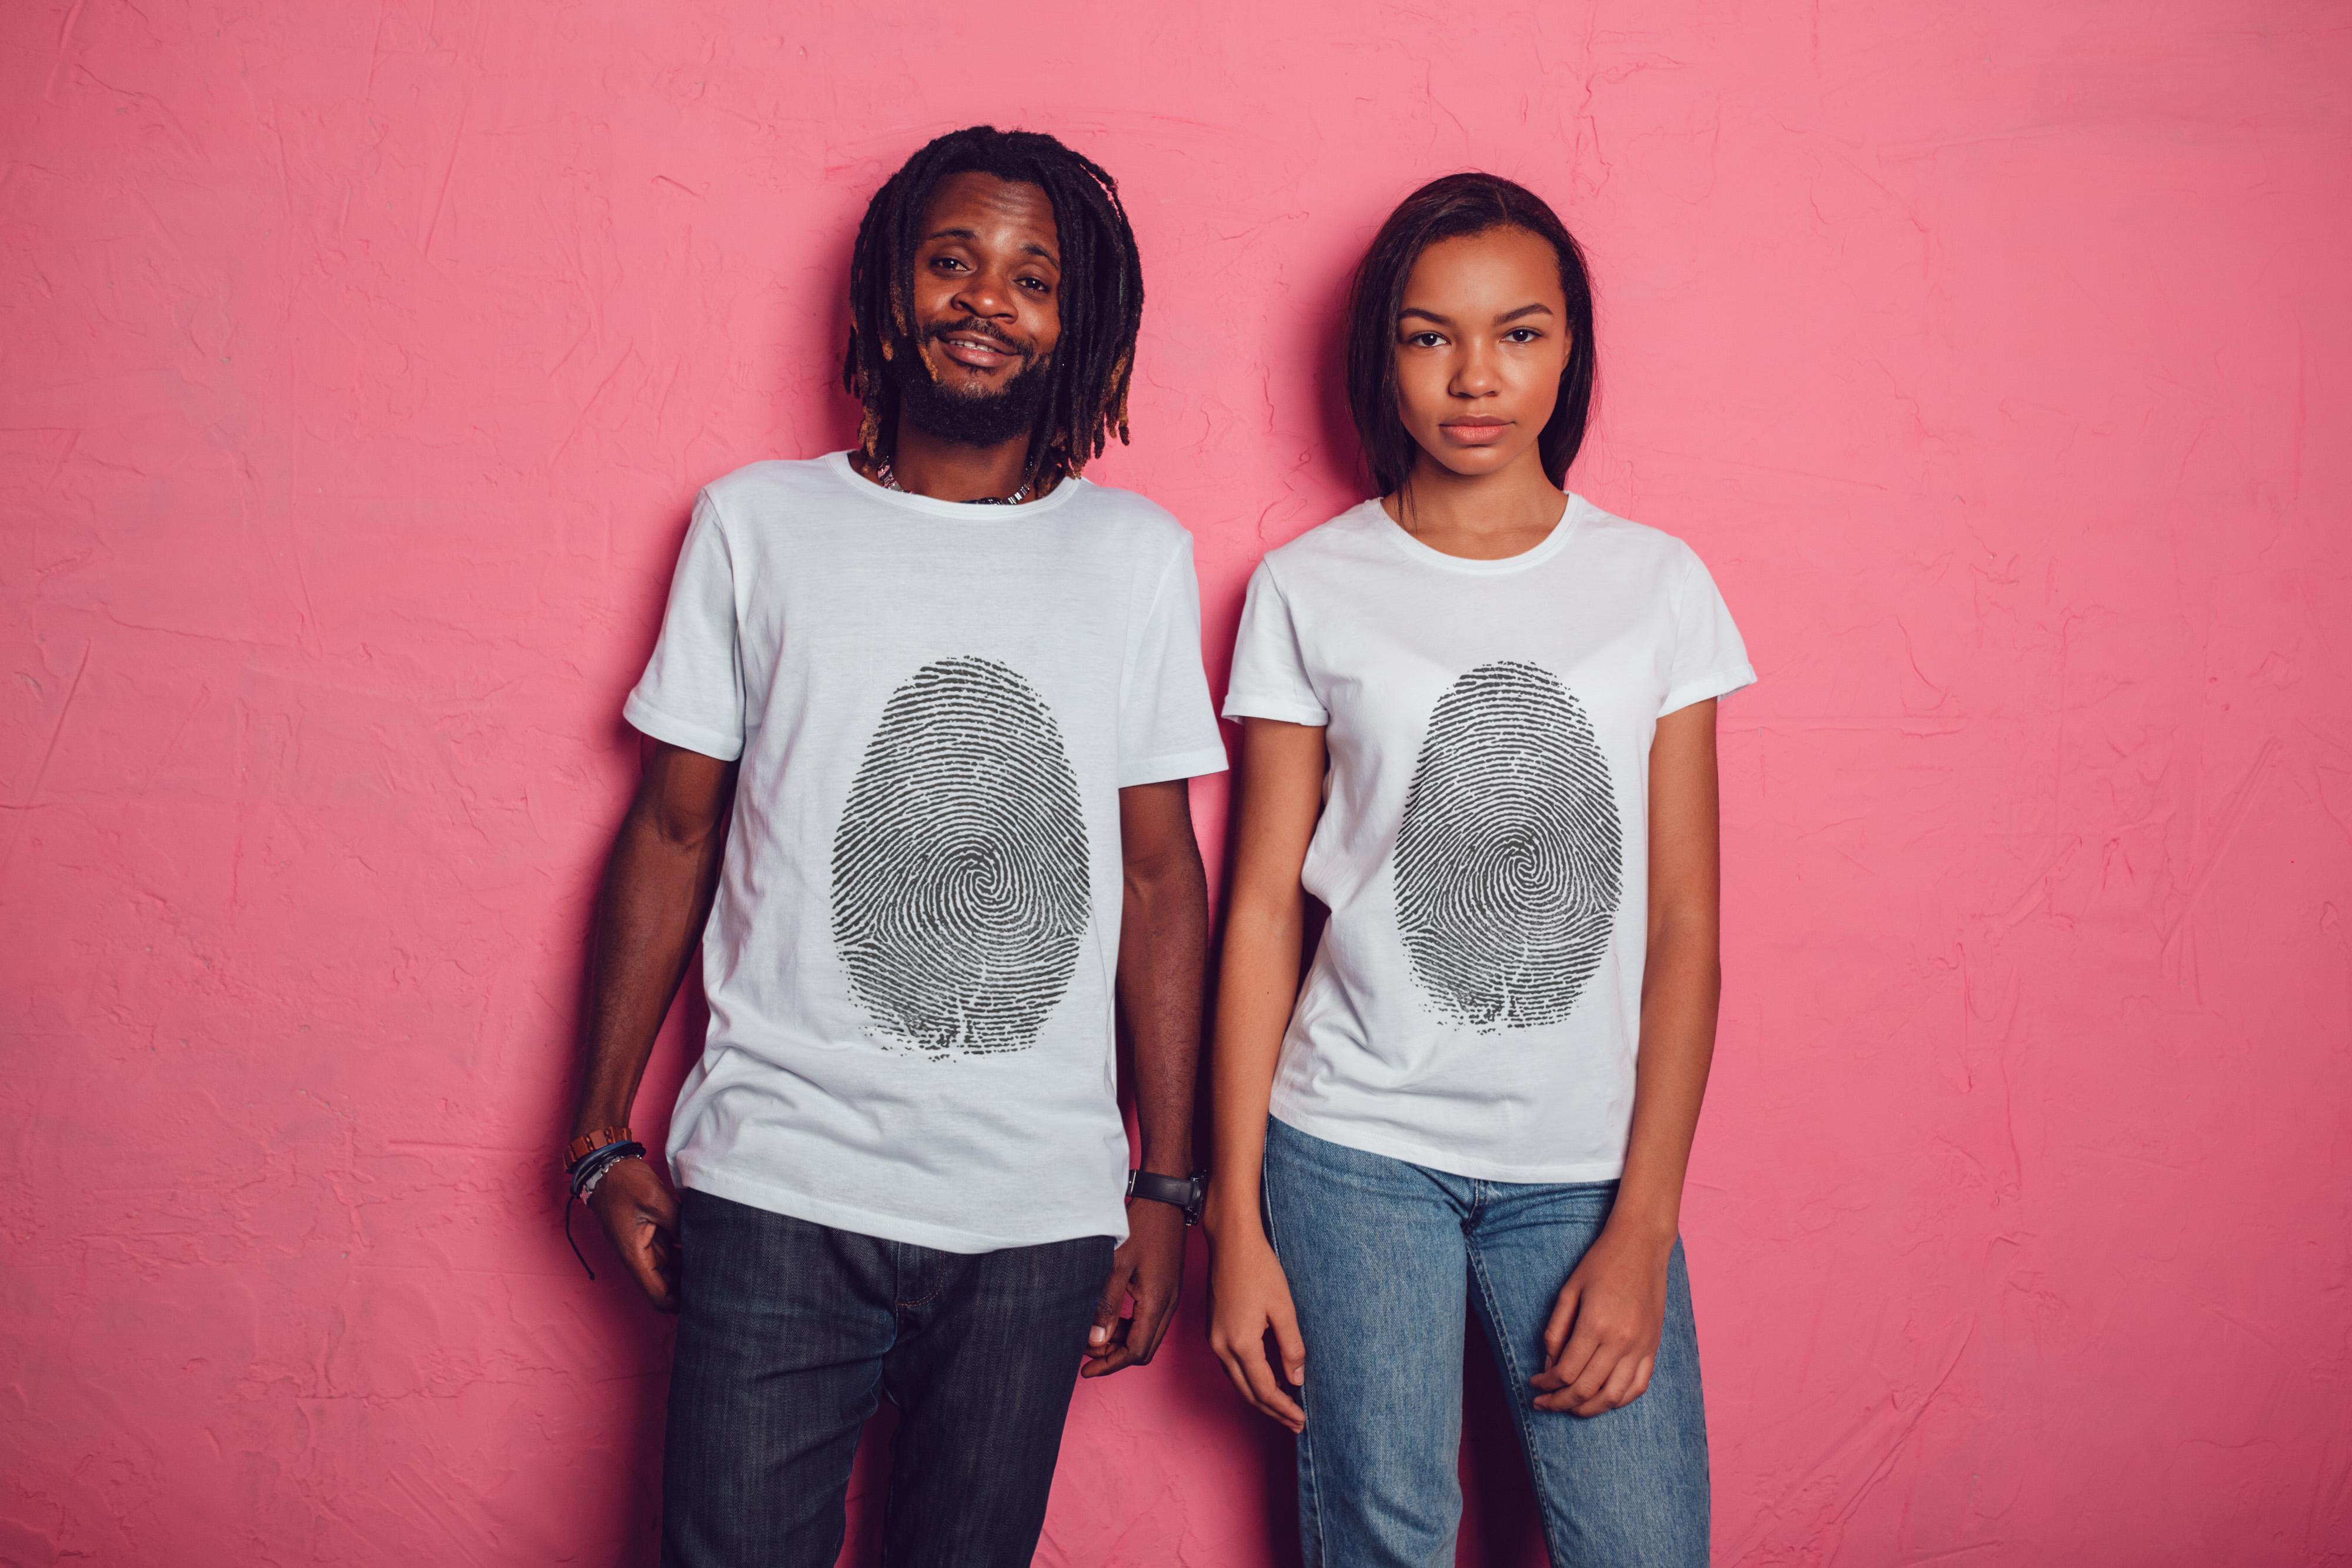 T-Shirt Mock-Up 2018 #1 example image 8